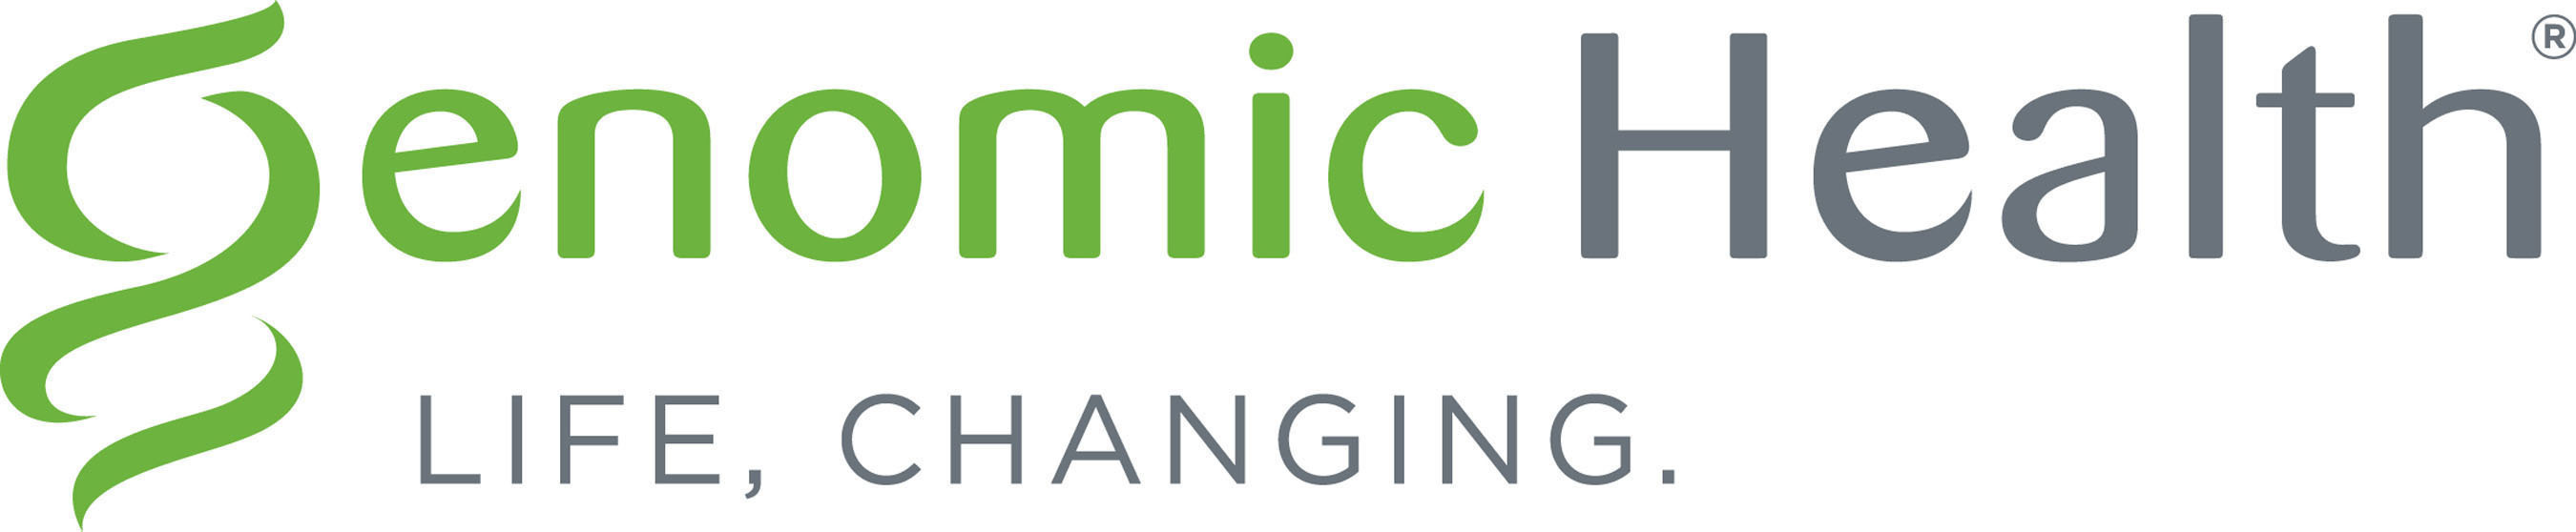 Genomic Health, Inc. logo.